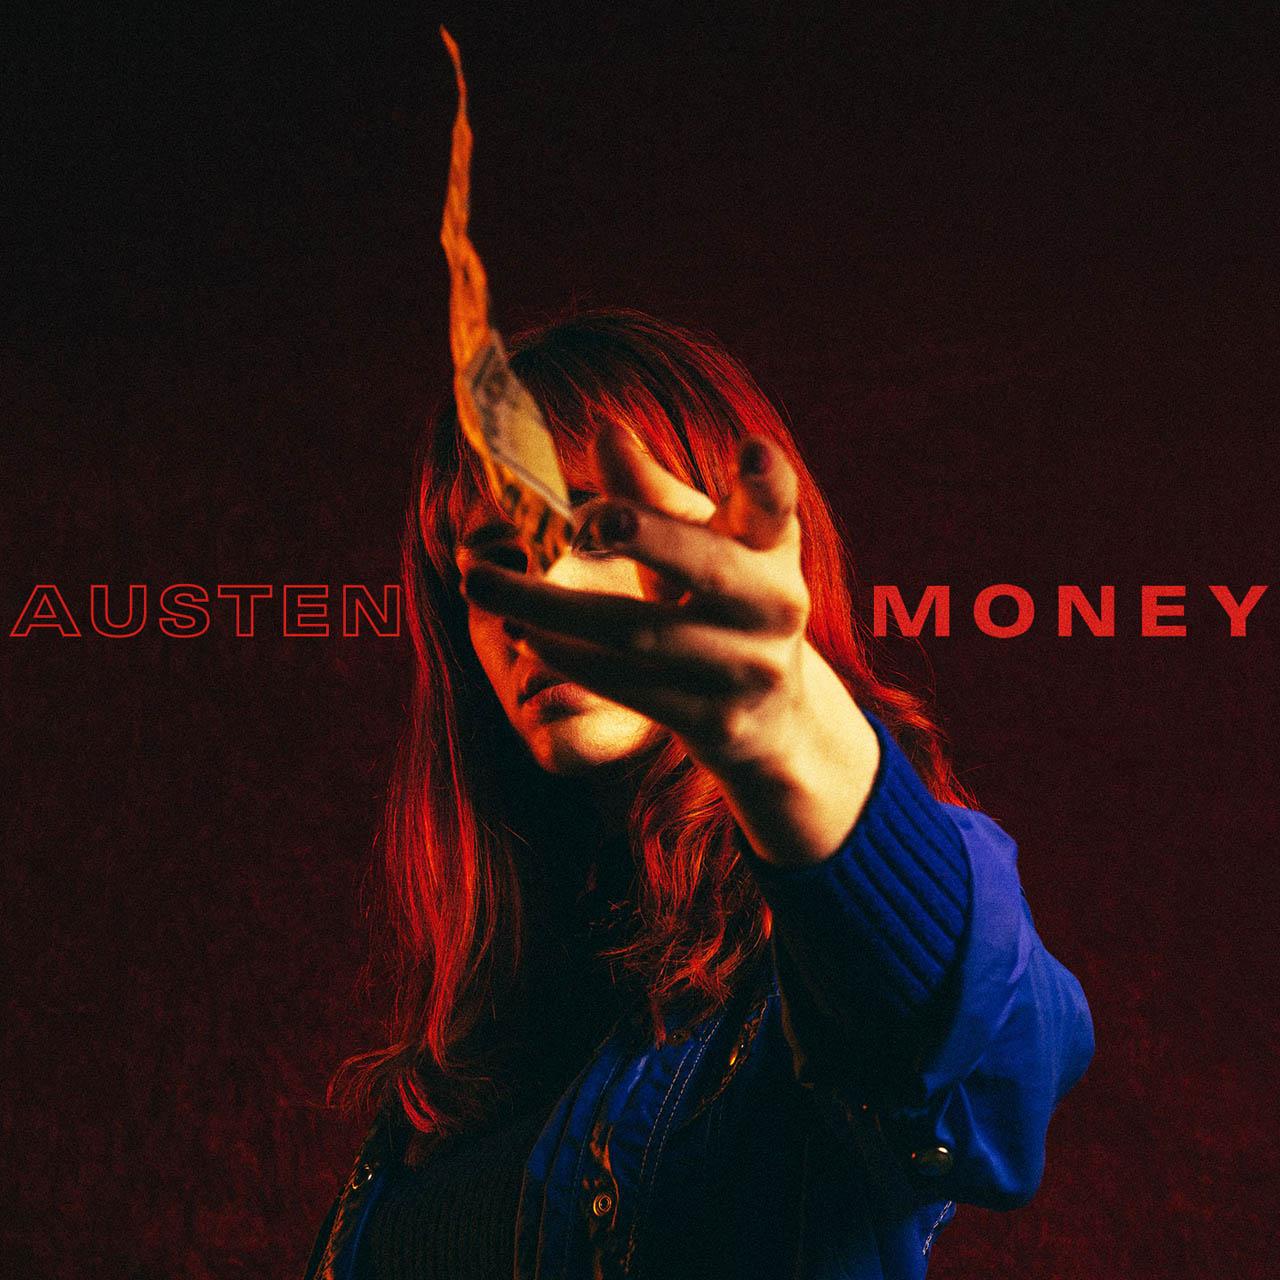 Austen - Money